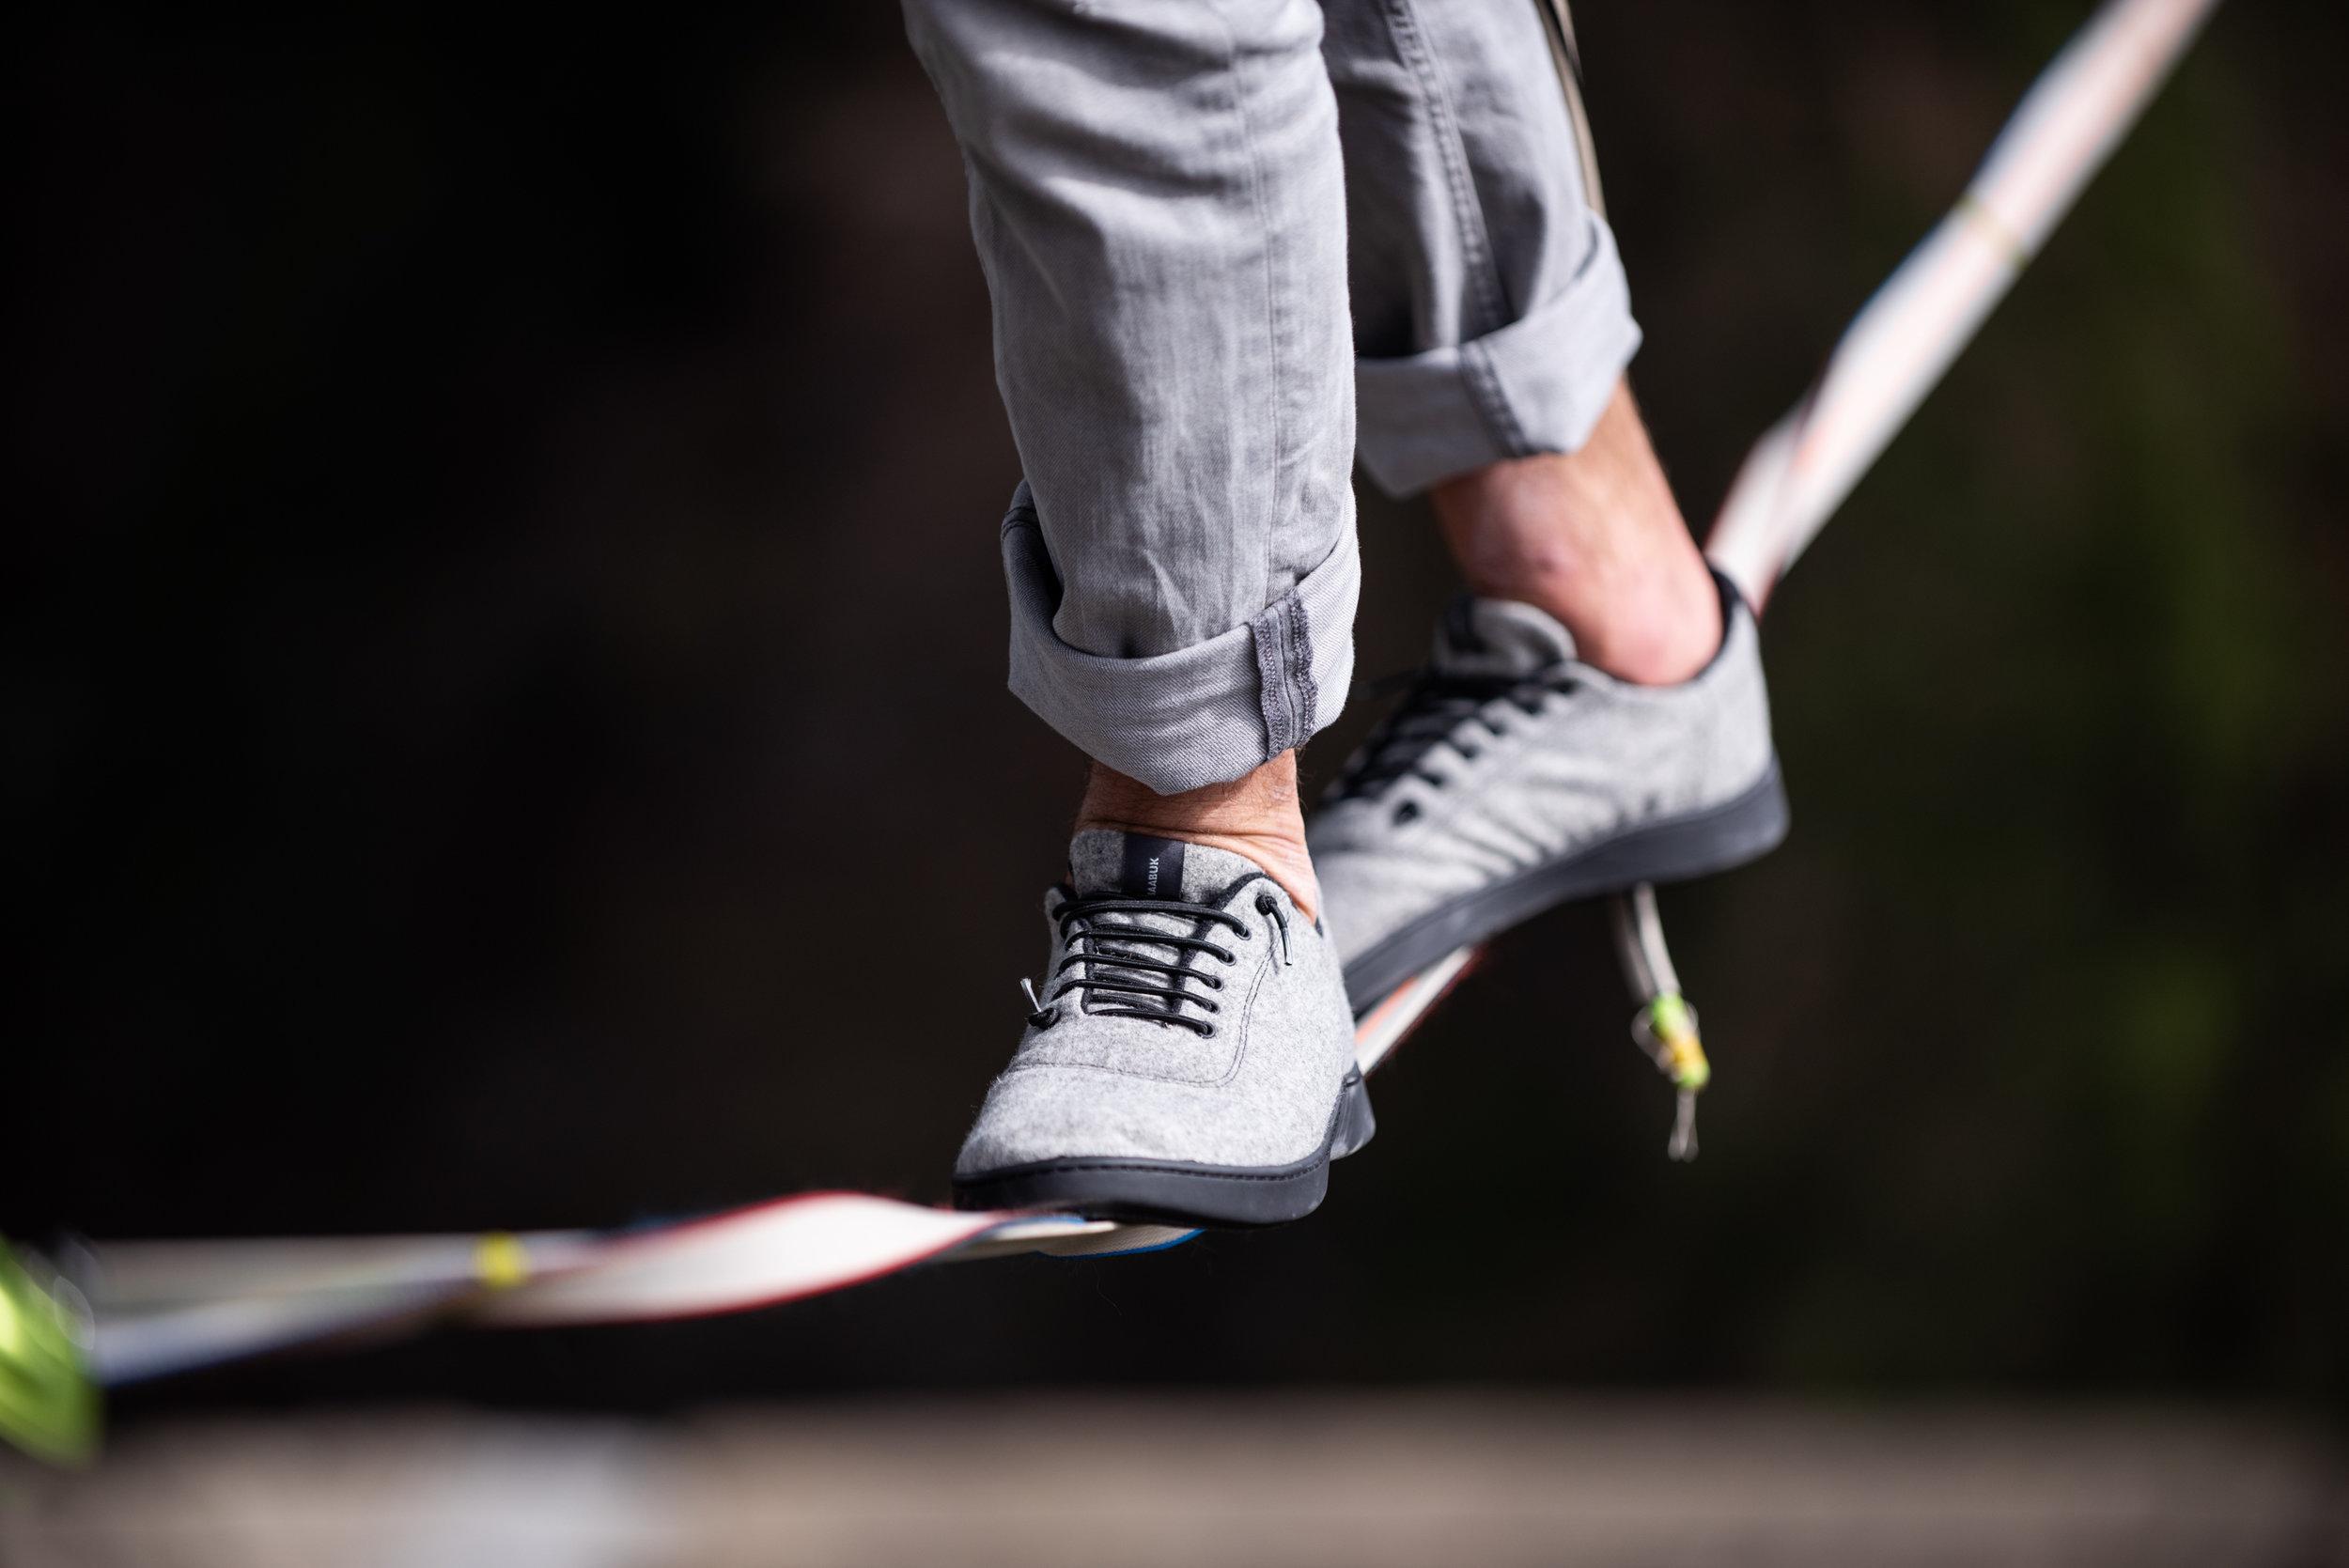 Baabuk, chaussure, laine,  Vevey, Suisse, Slackline Lyell Grunberg show performance spectacle Highline trickline (20).jpg